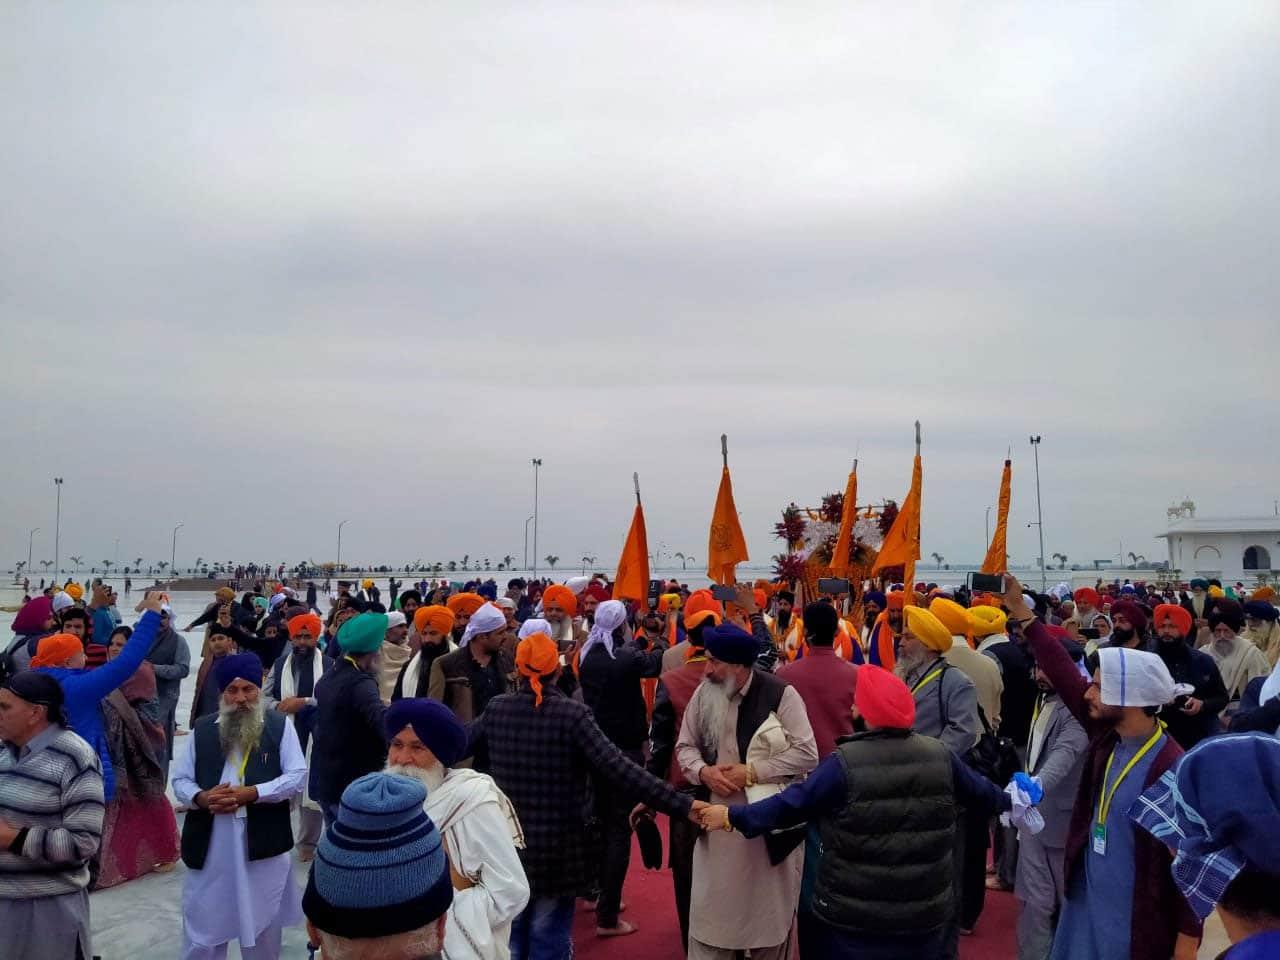 Sikh devotees partake in celebrations